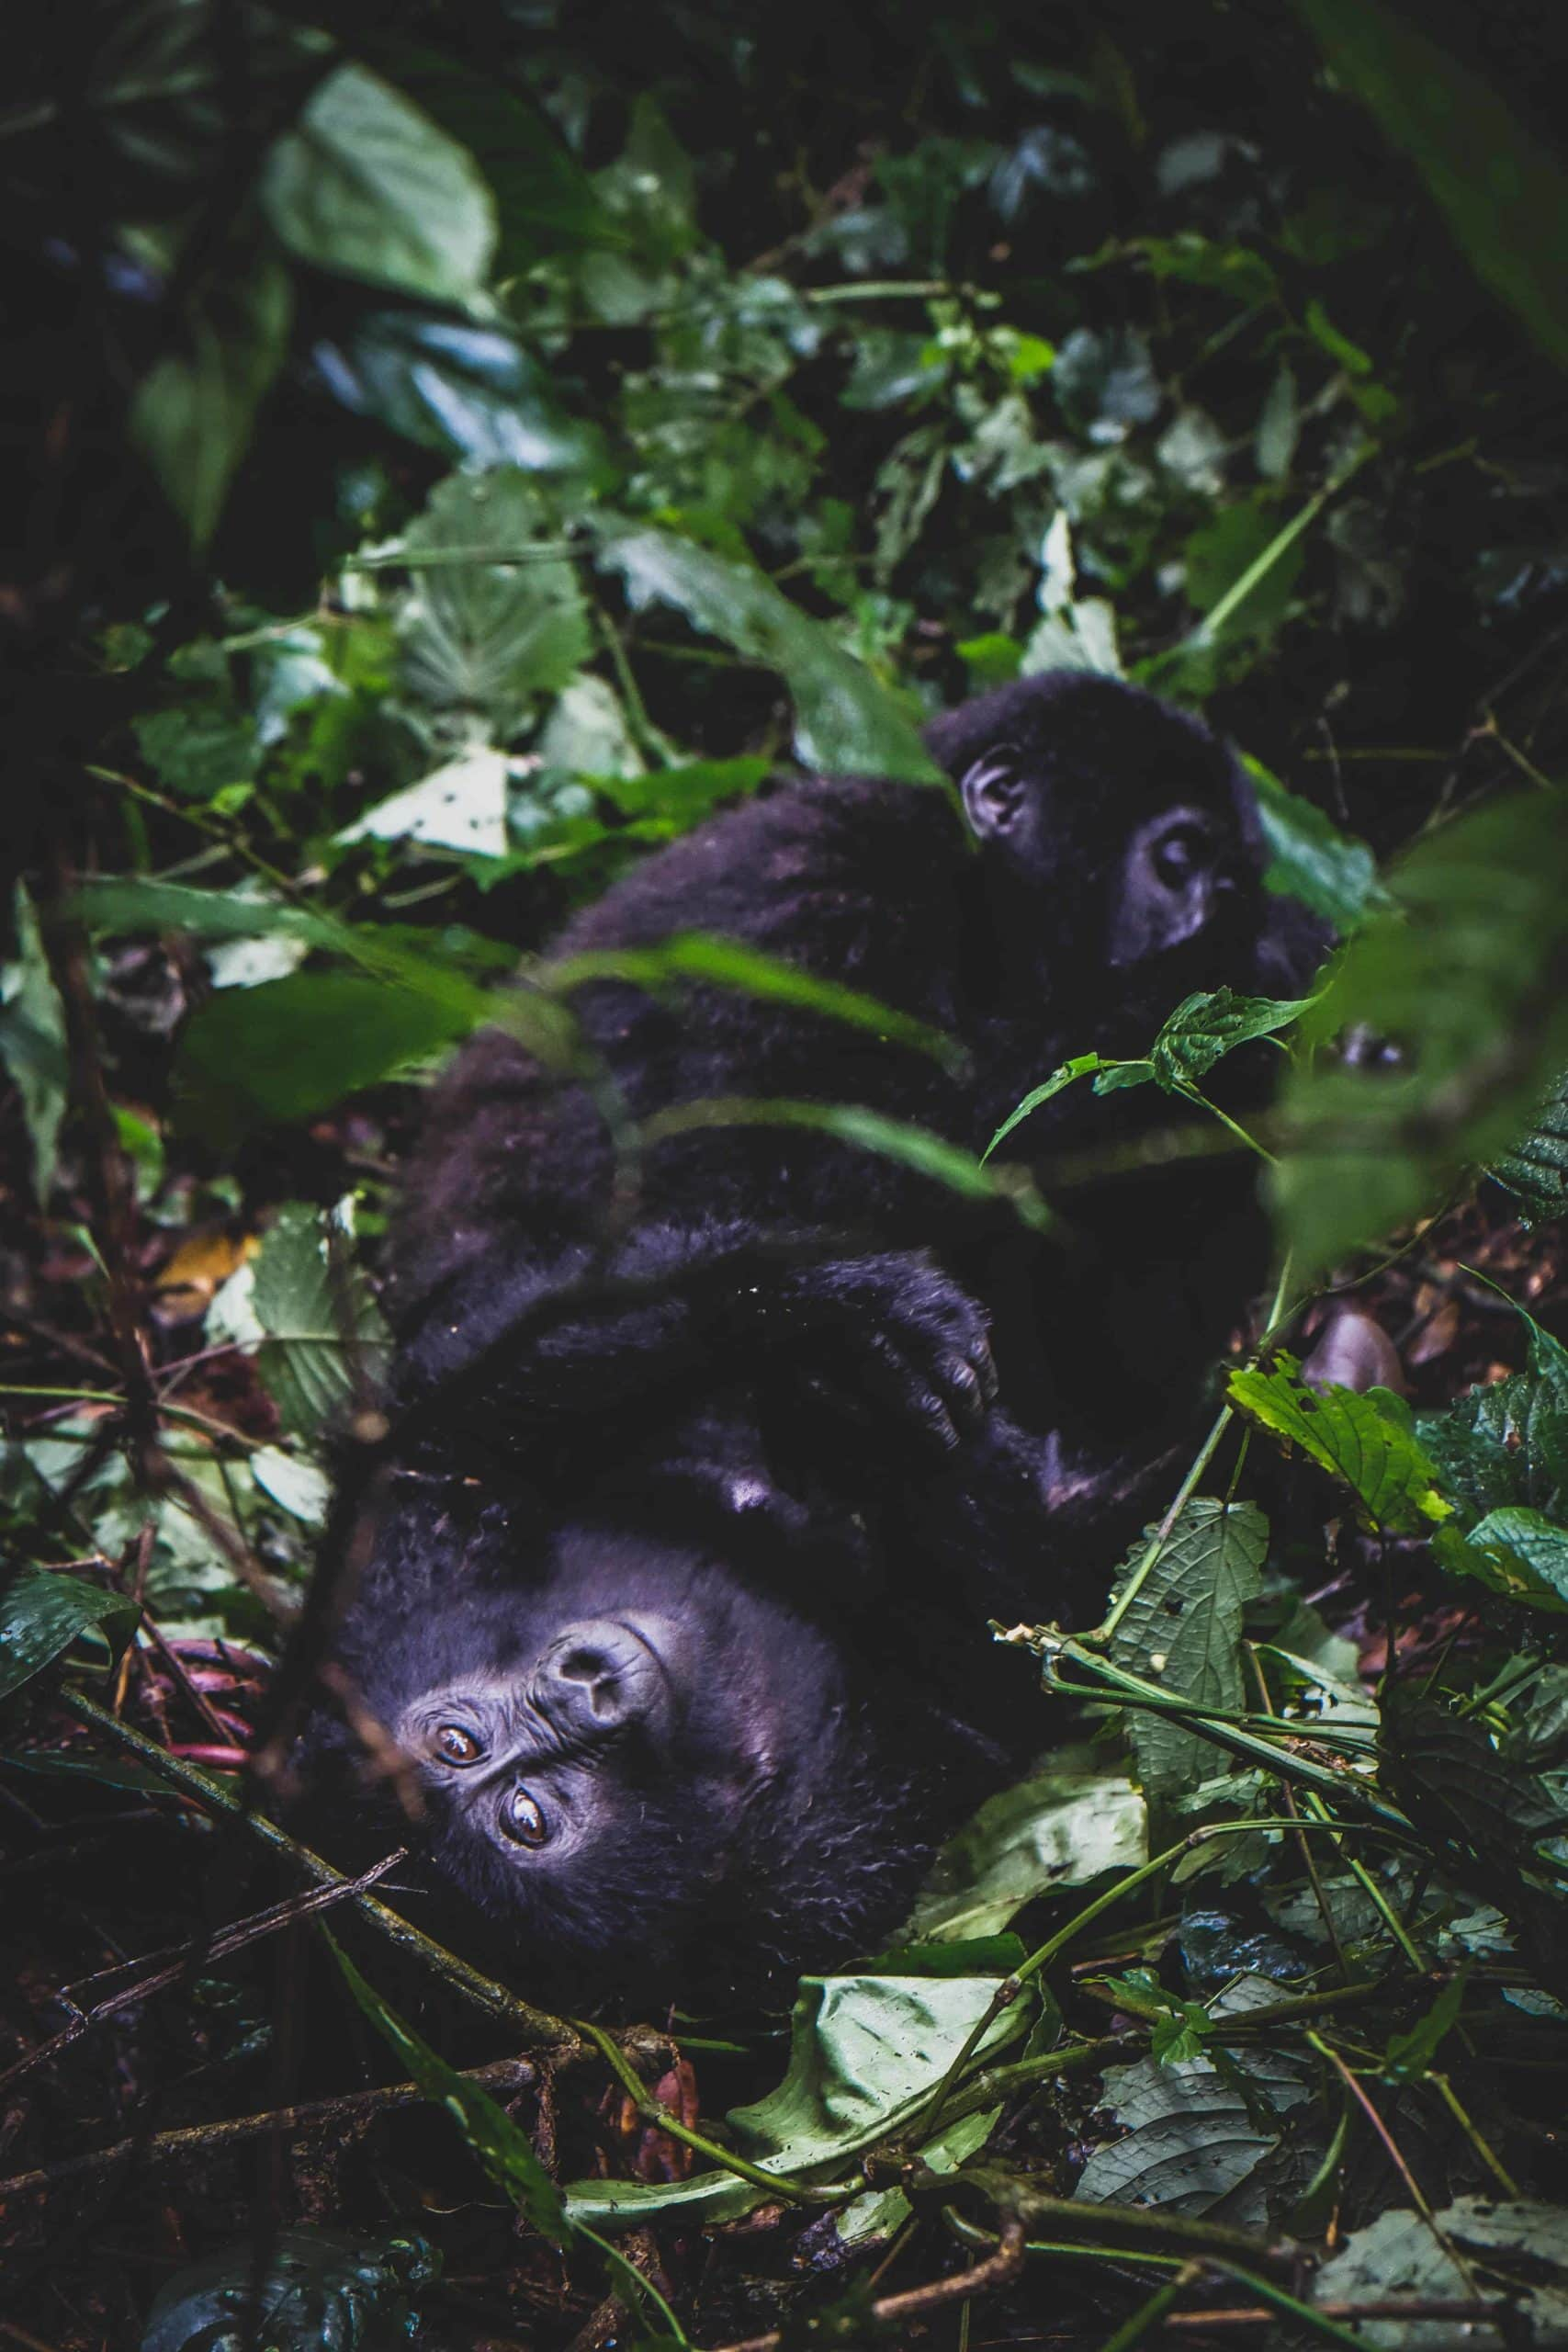 Gorilla Lounging